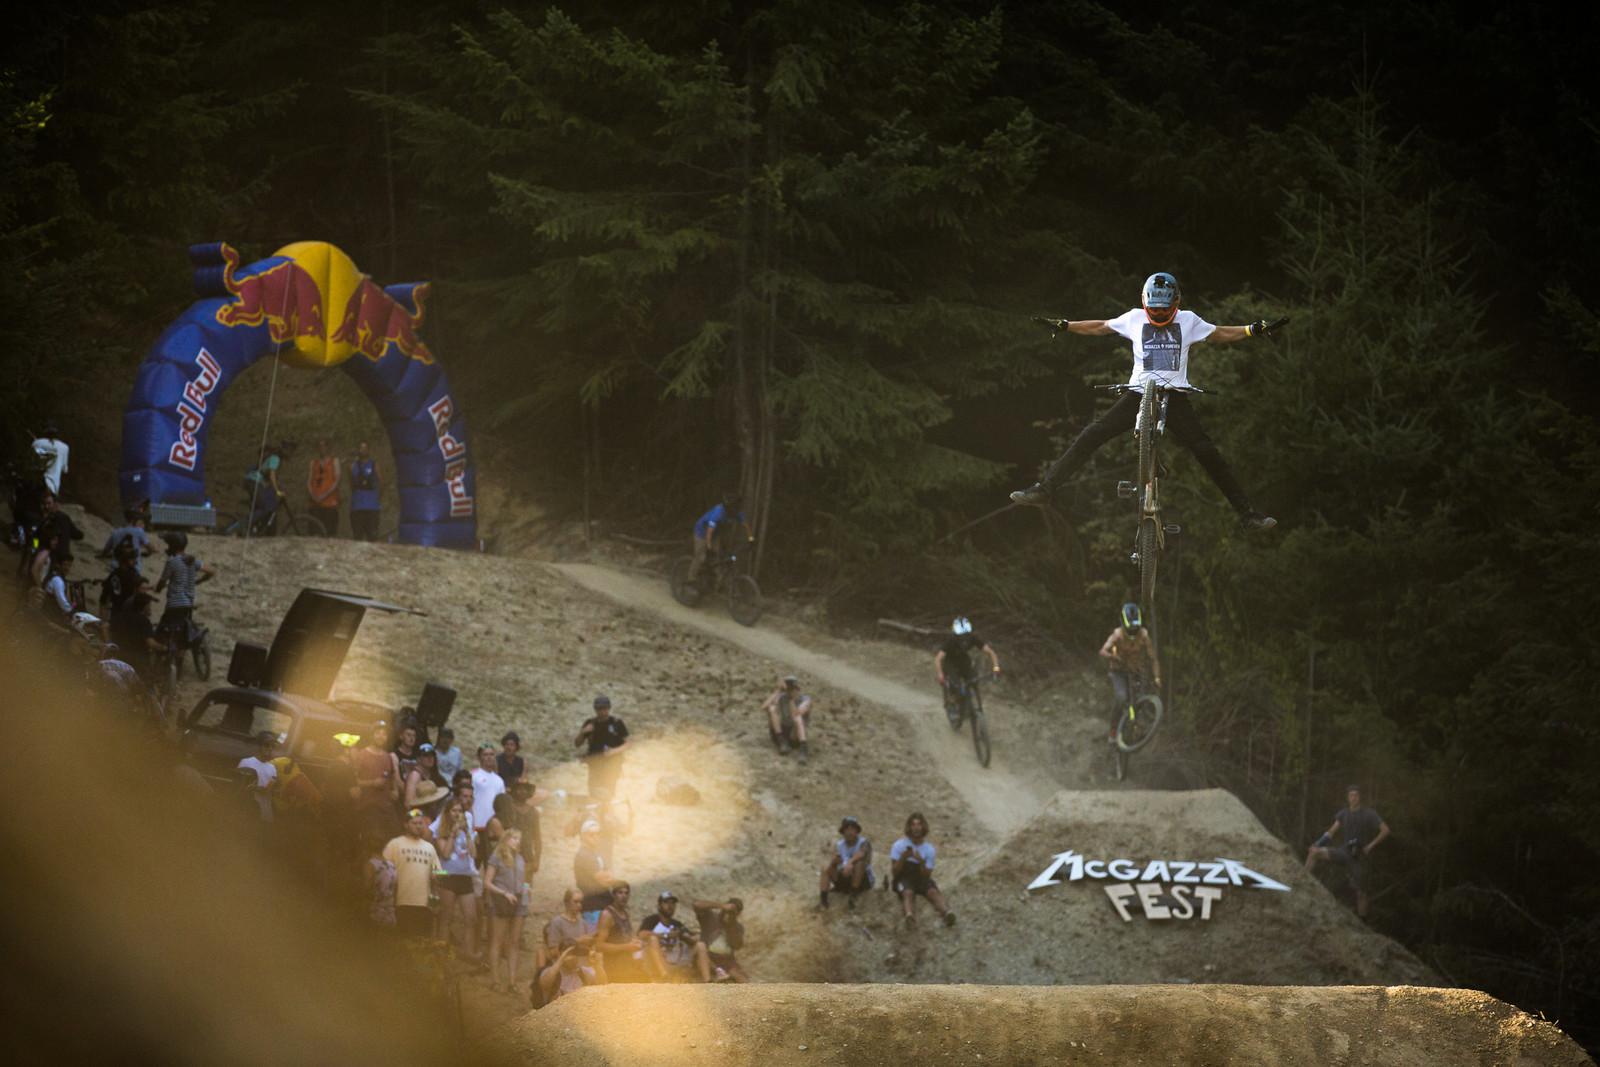 Emmerson Wilkinson - McGazza Fest Dream Track Jam - Mountain Biking Pictures - Vital MTB